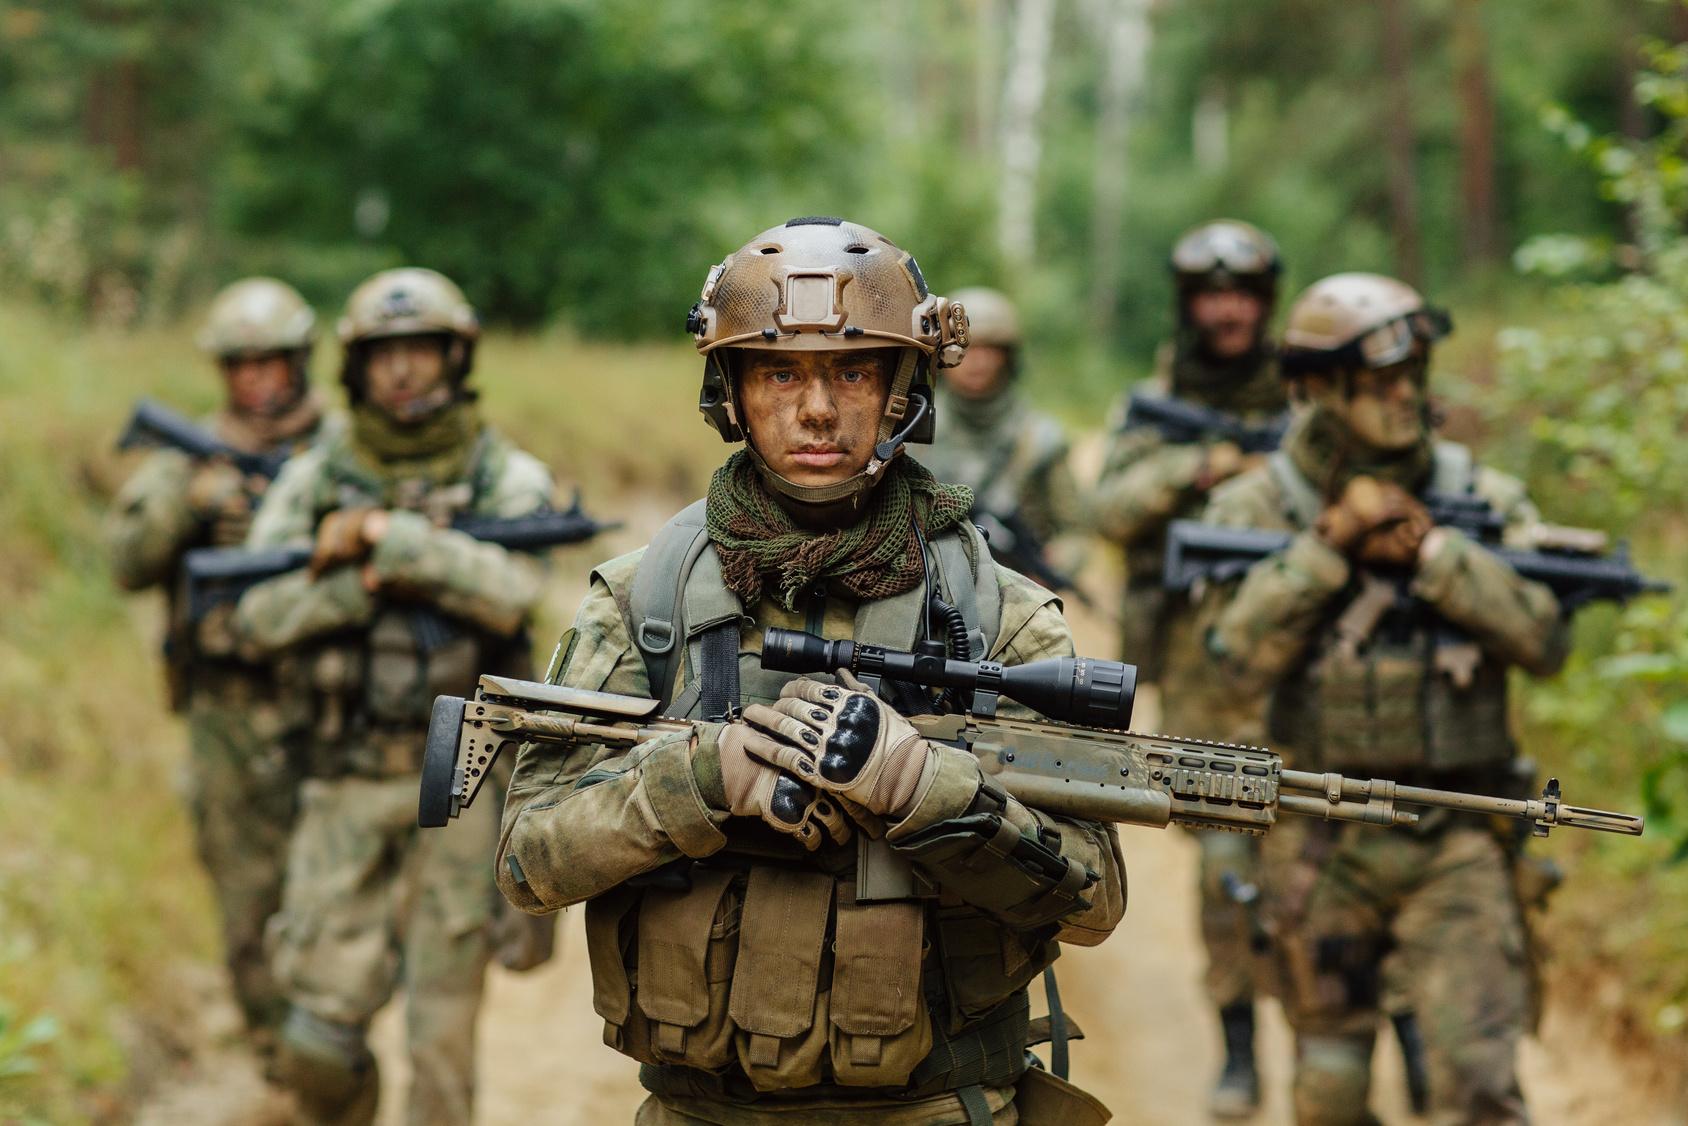 Shrike Airsoft patrol rifles gear